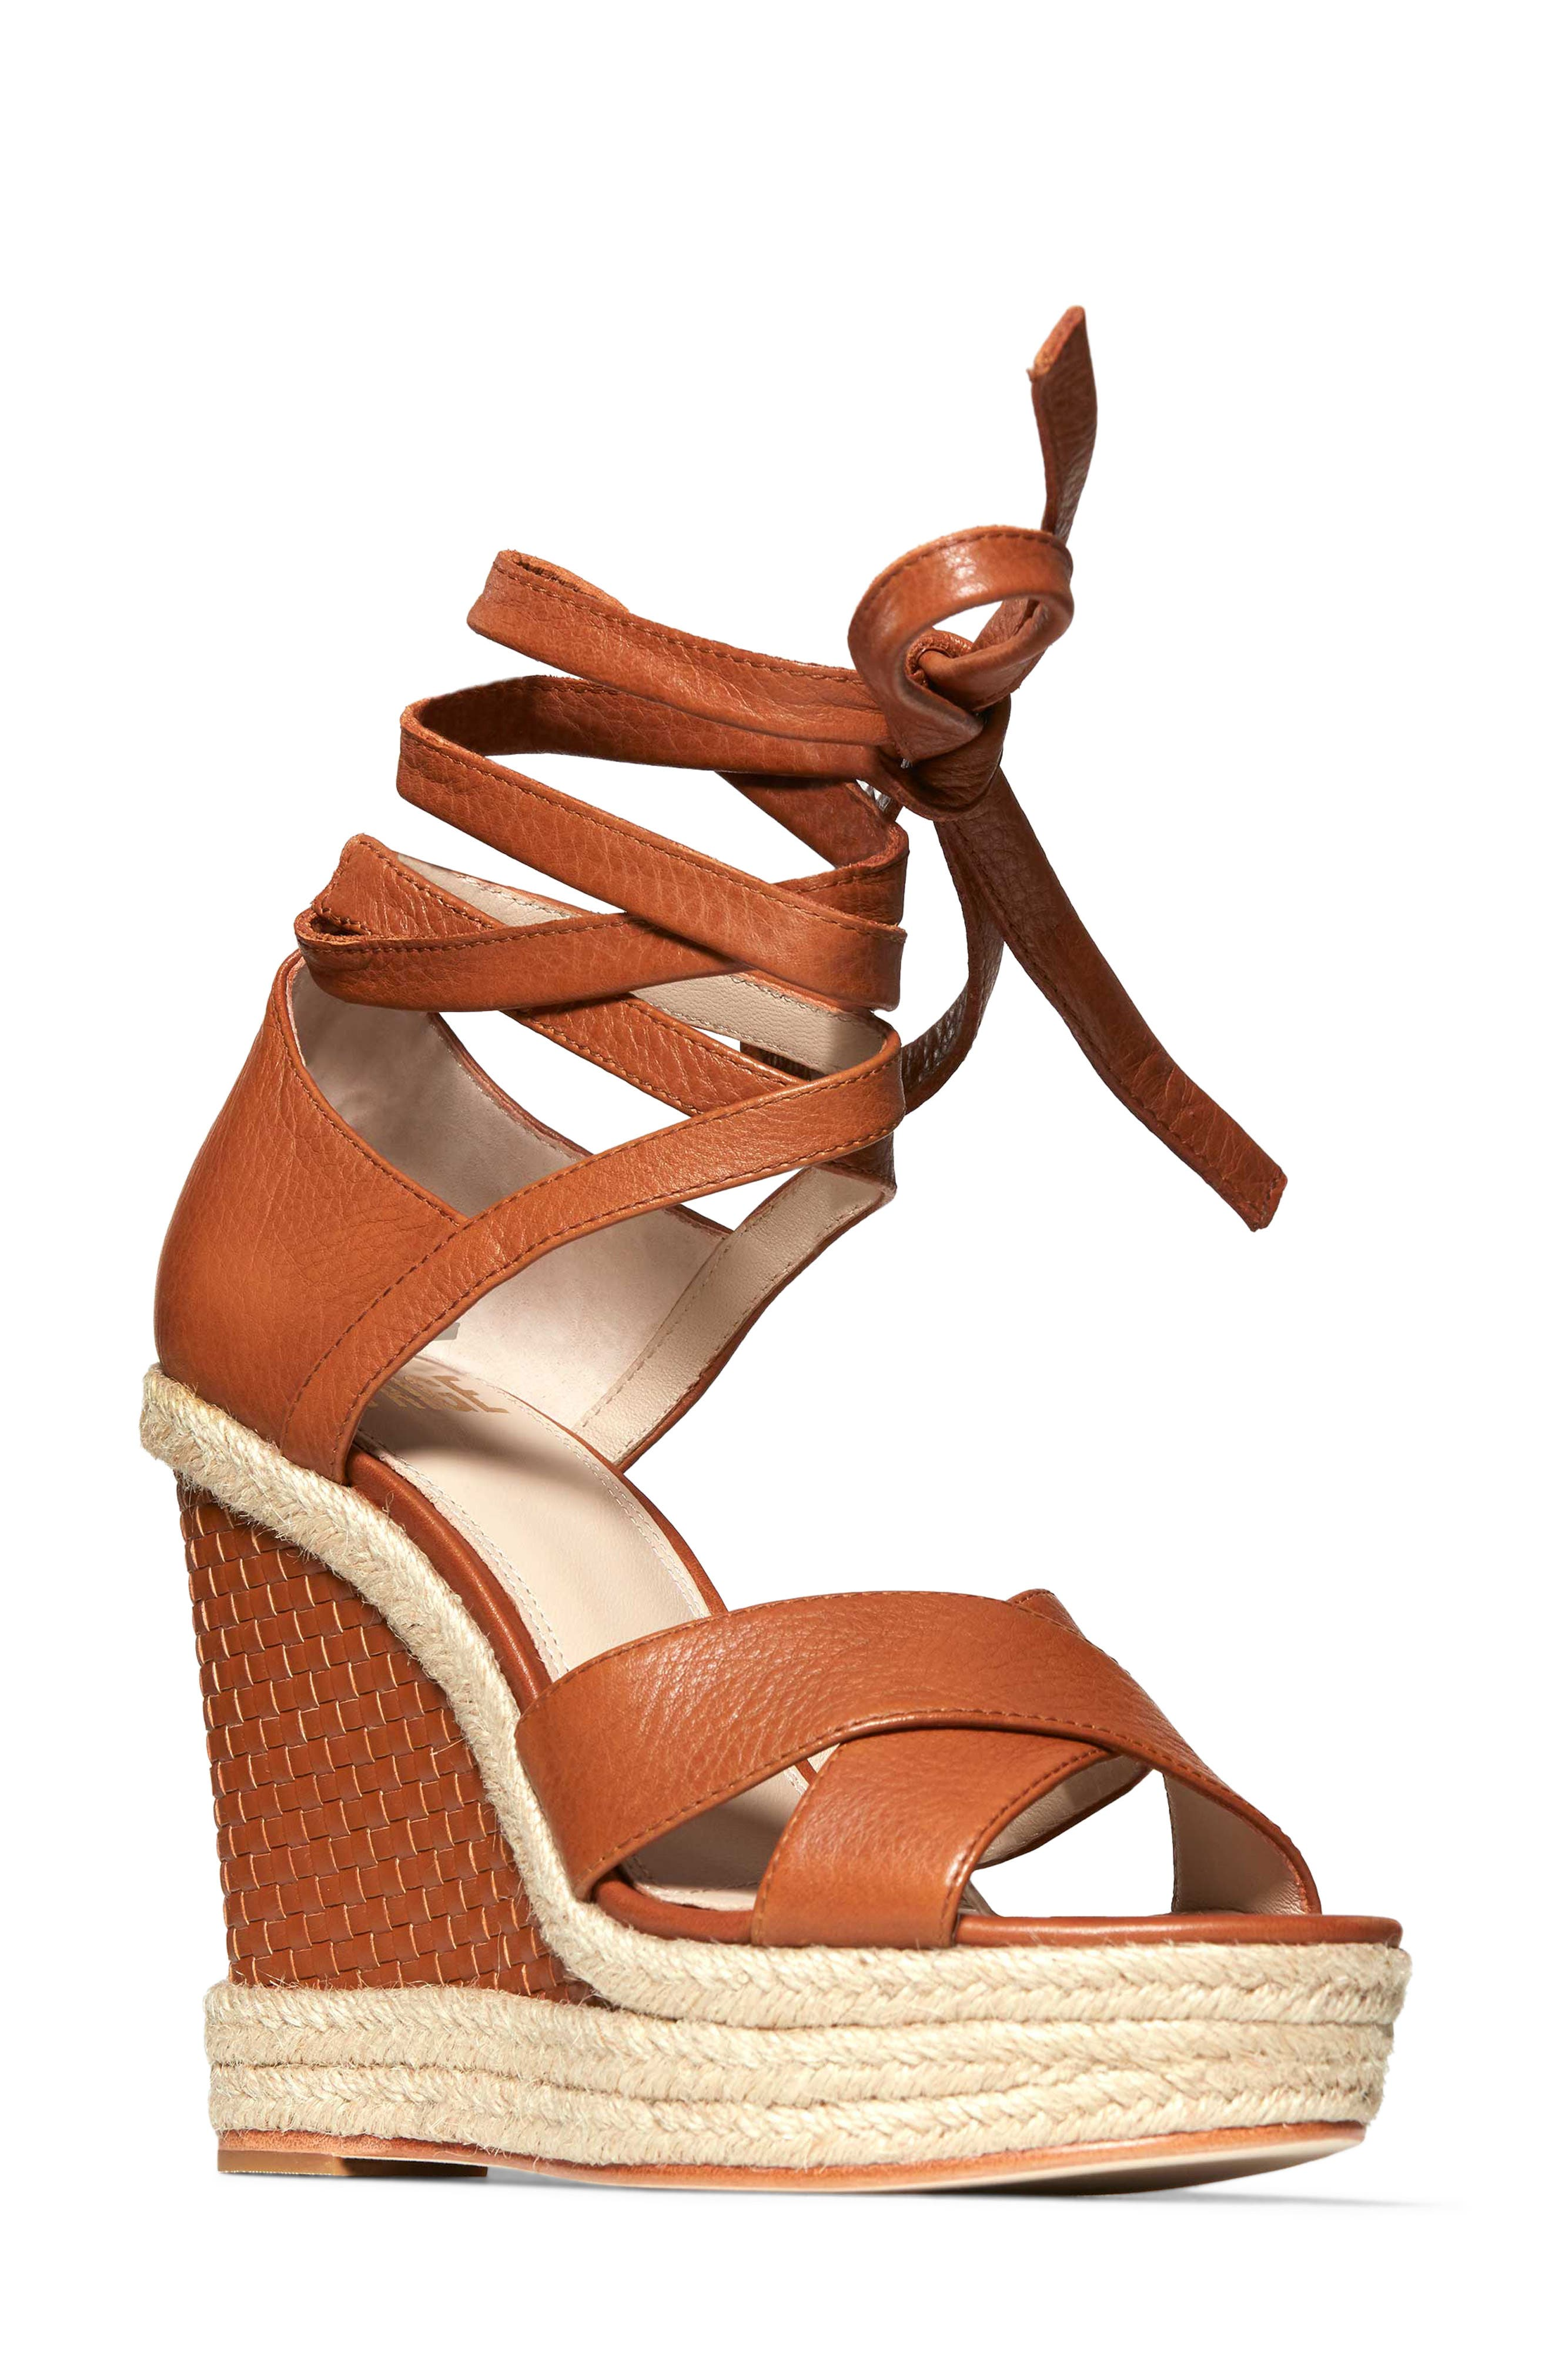 Image of PAIGE Talia Wedge Ankle Wrap Sandal